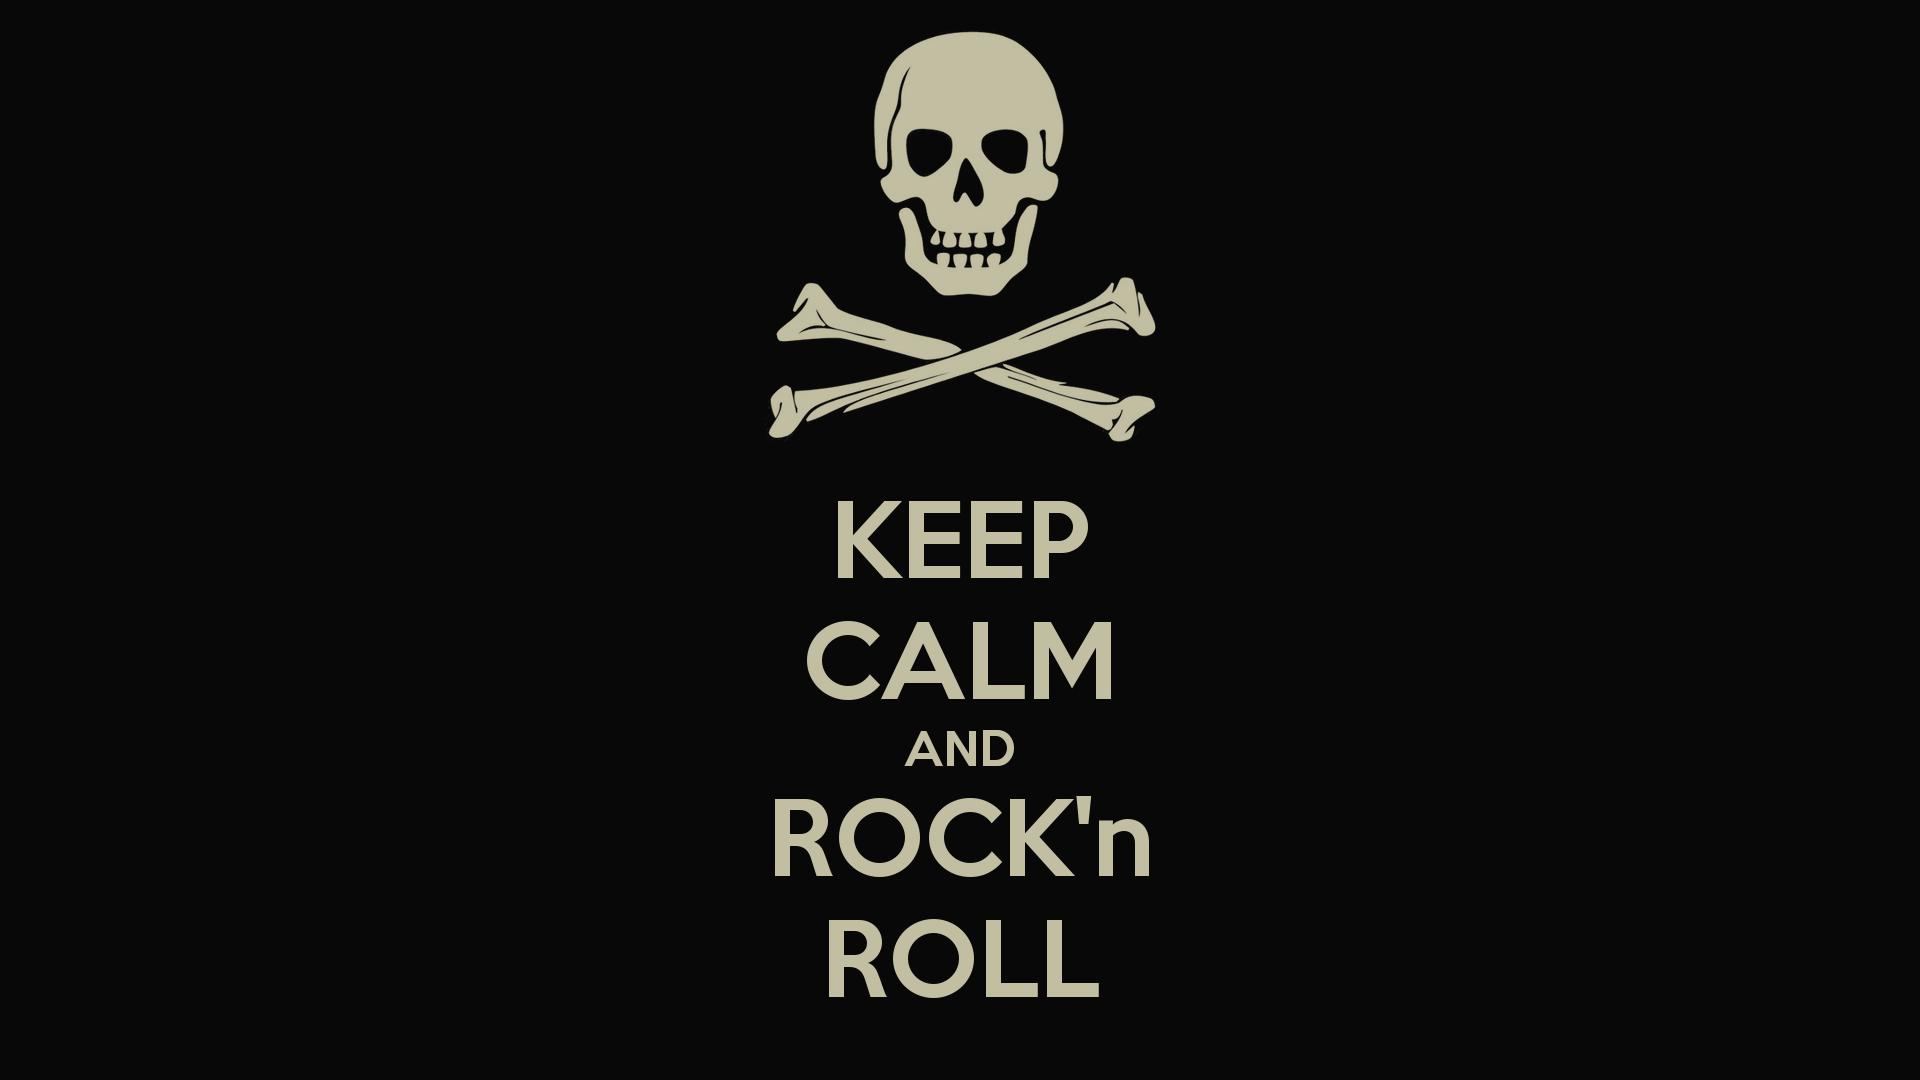 Rock N Roll wallpaper 1920x1080 28811 1920x1080